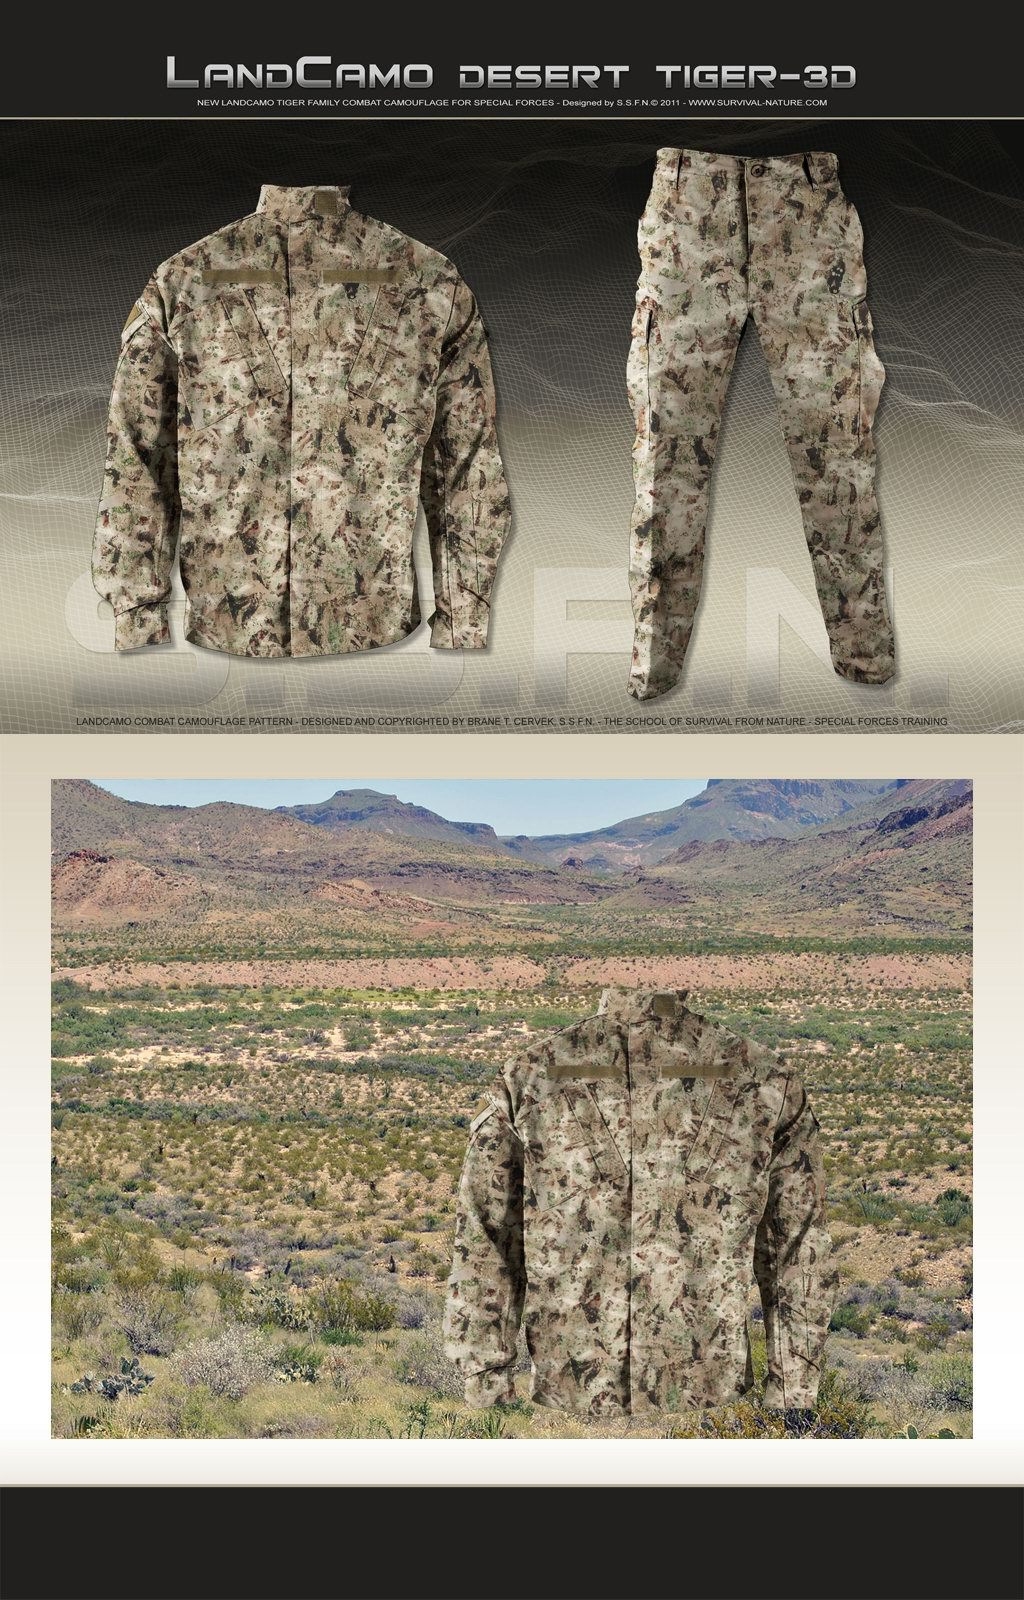 SSFN LandCamo DESERT TIGER 3D Combat Camouflage Pattern 1 <!  :en  >SSFN ExtremePro LandCamo Terrain Specific/Mission Specific Digital Combat Camouflage Patterns <!  :  >